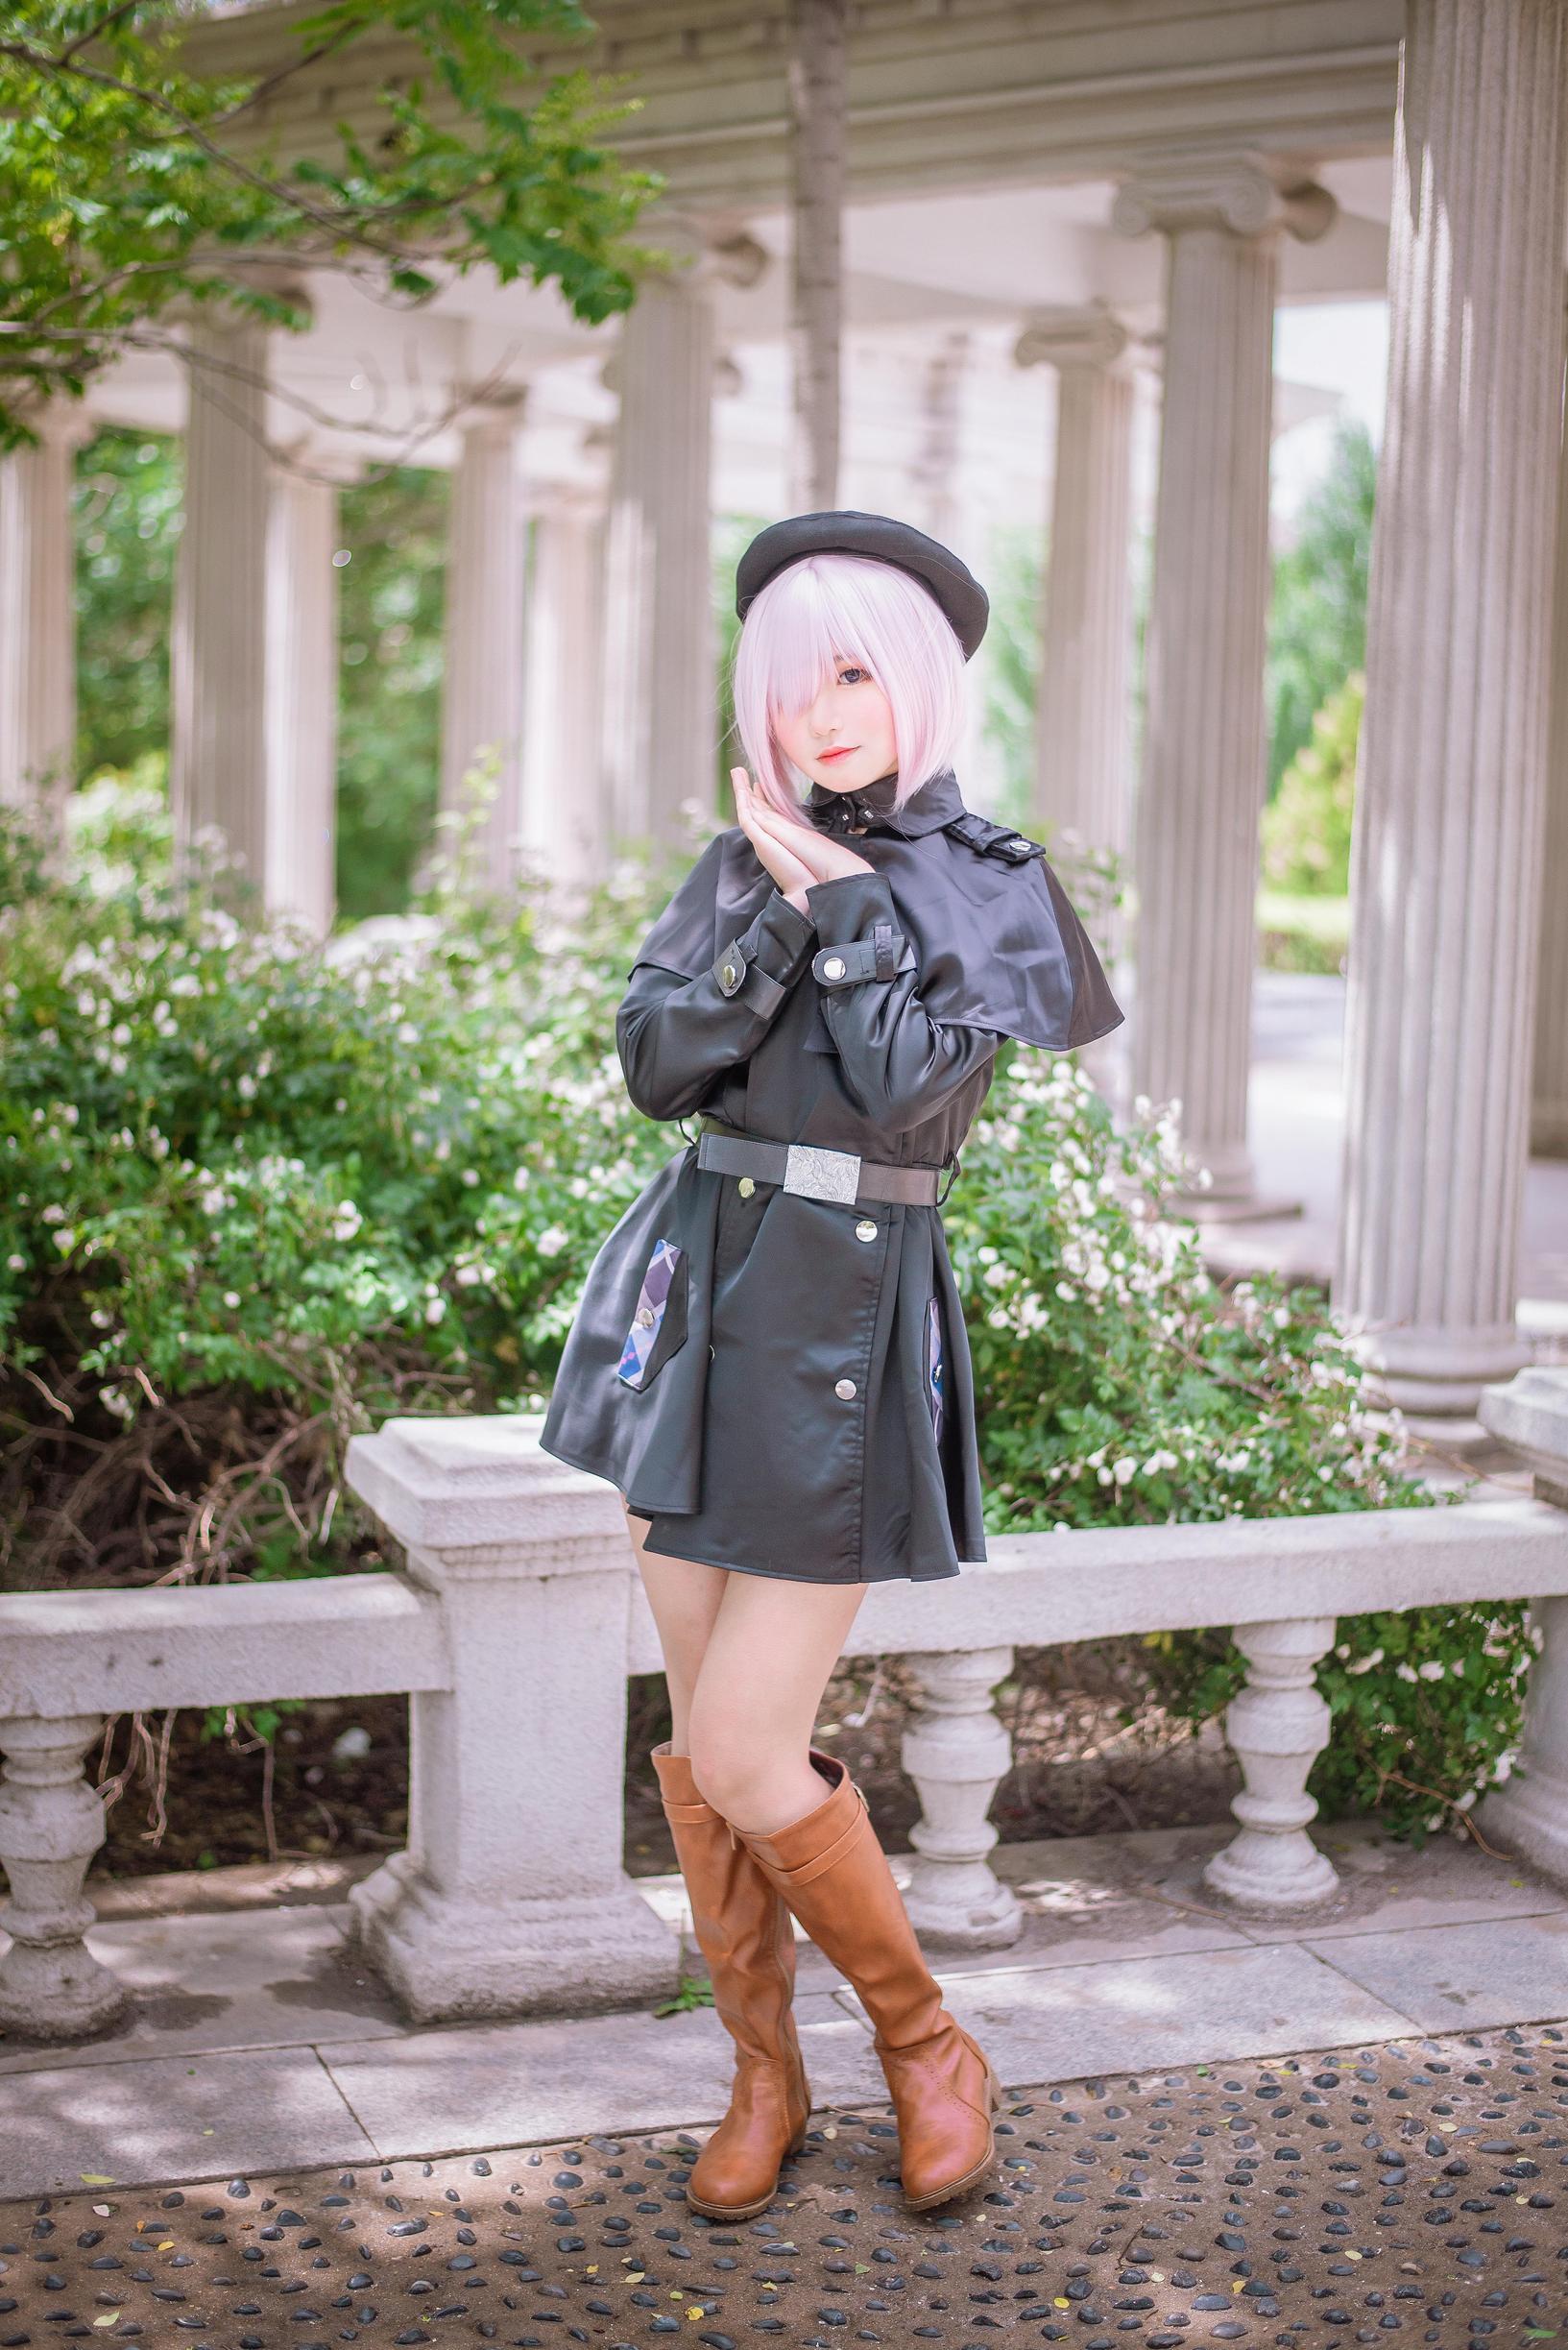 《FATE/GRAND ORDER》正片cosplay【CN:这个泡泡就是逊啦】-第9张